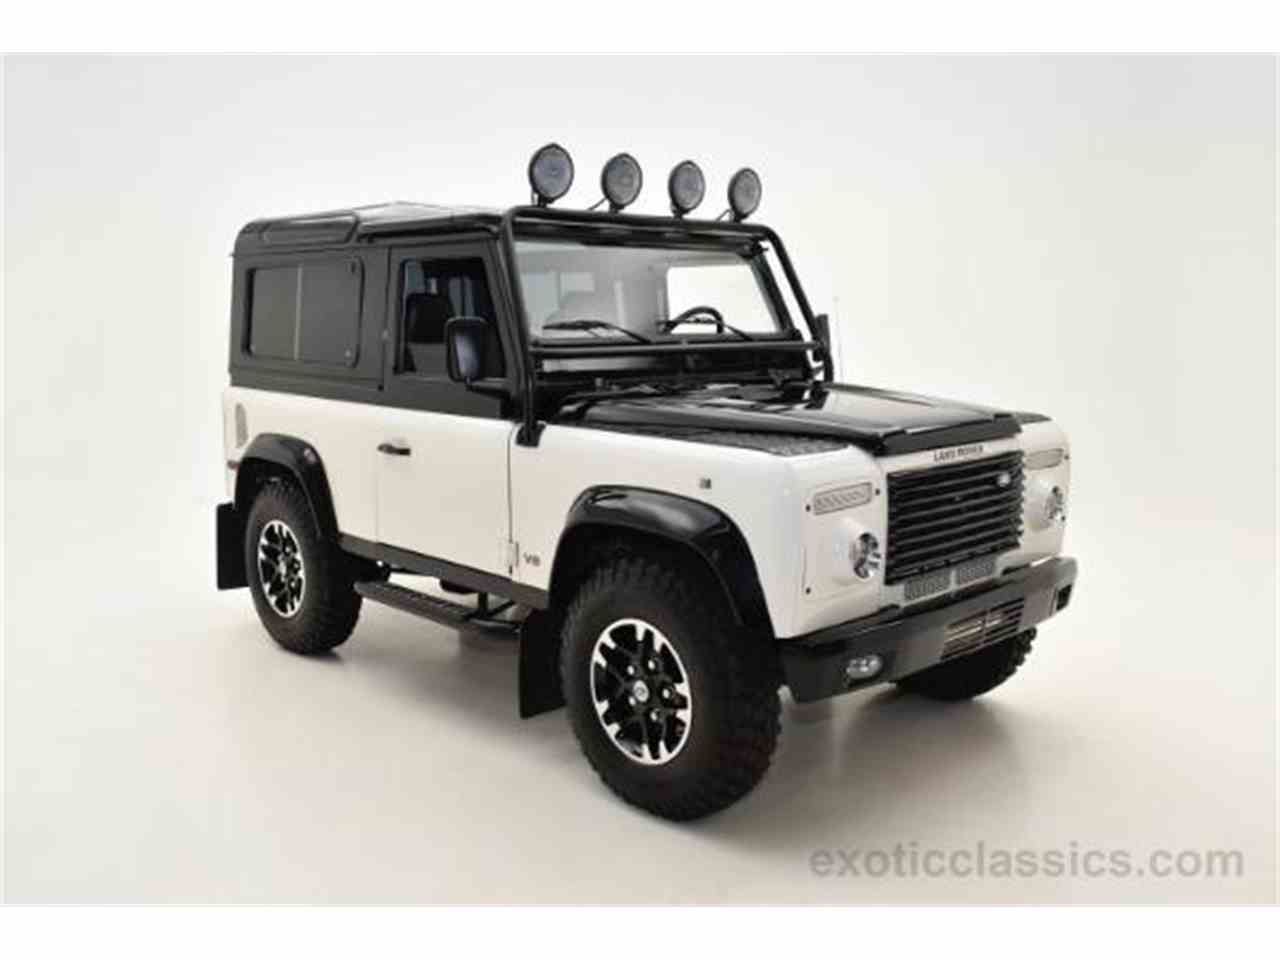 1997 Land Rover Defender for Sale - CC-990501